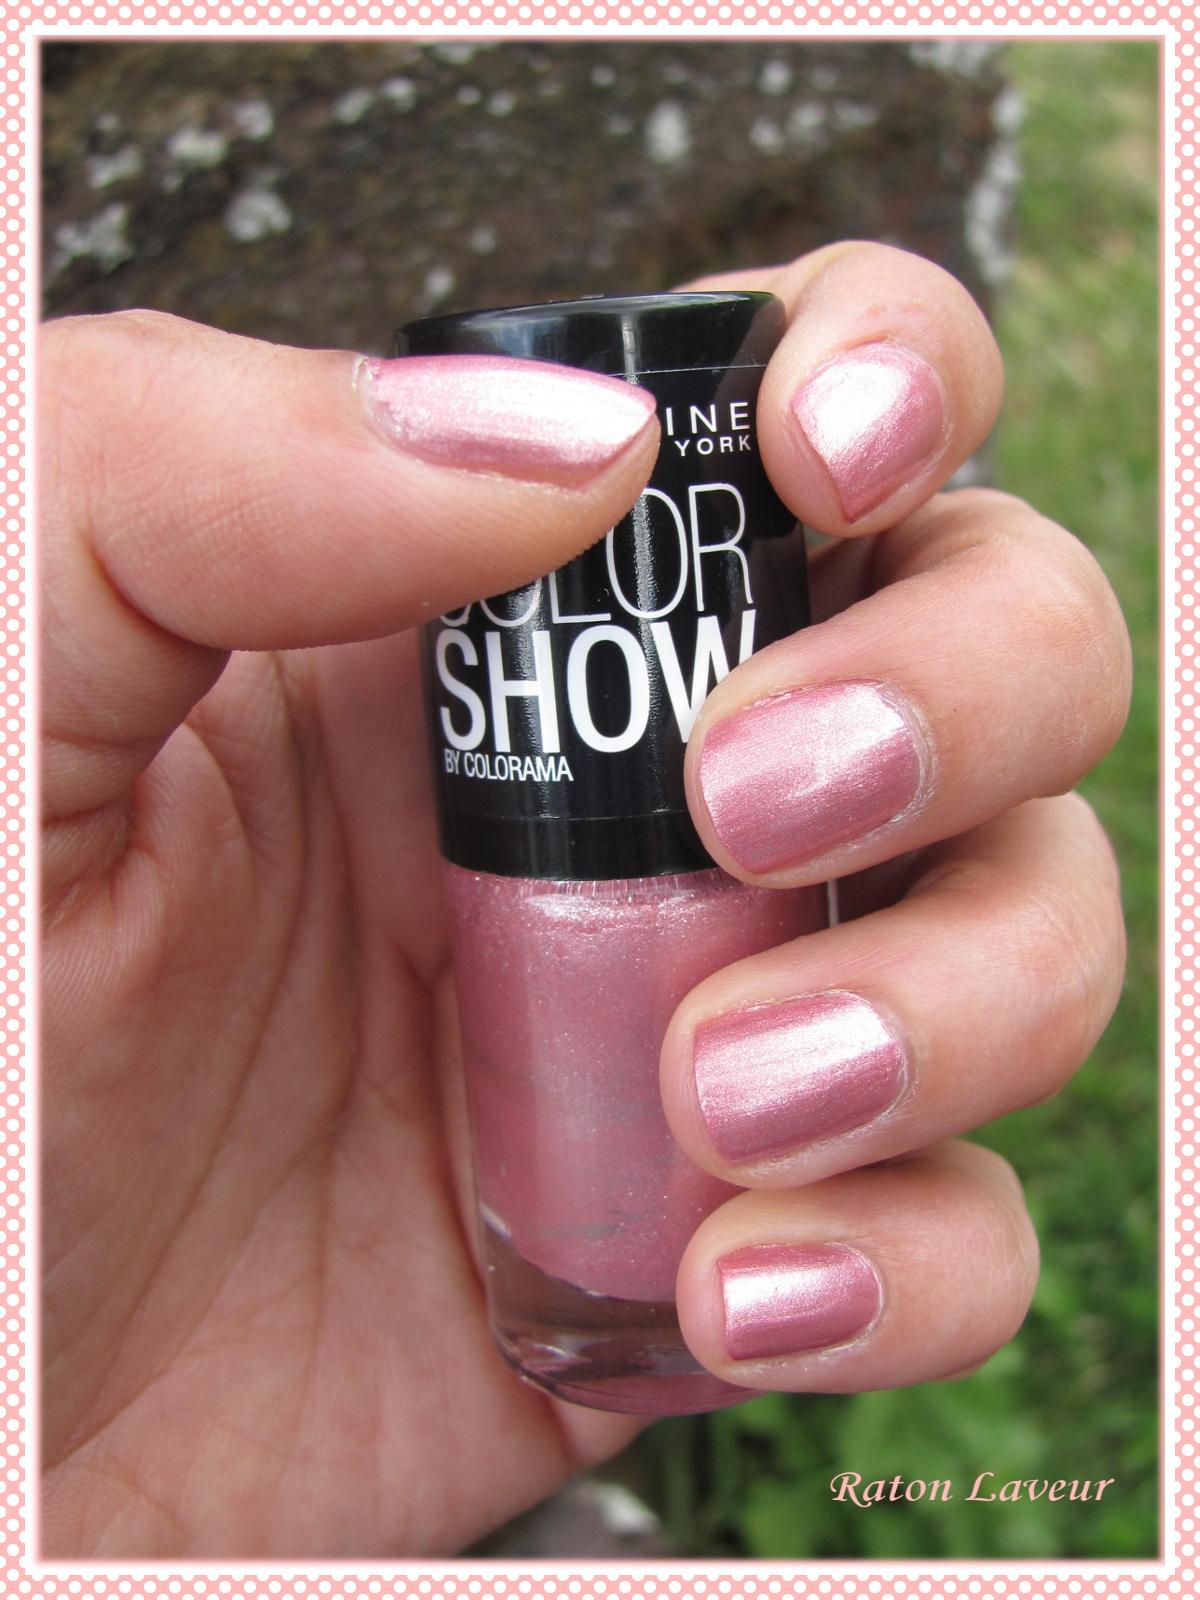 vernis colorshow rose - Vernis Color Show